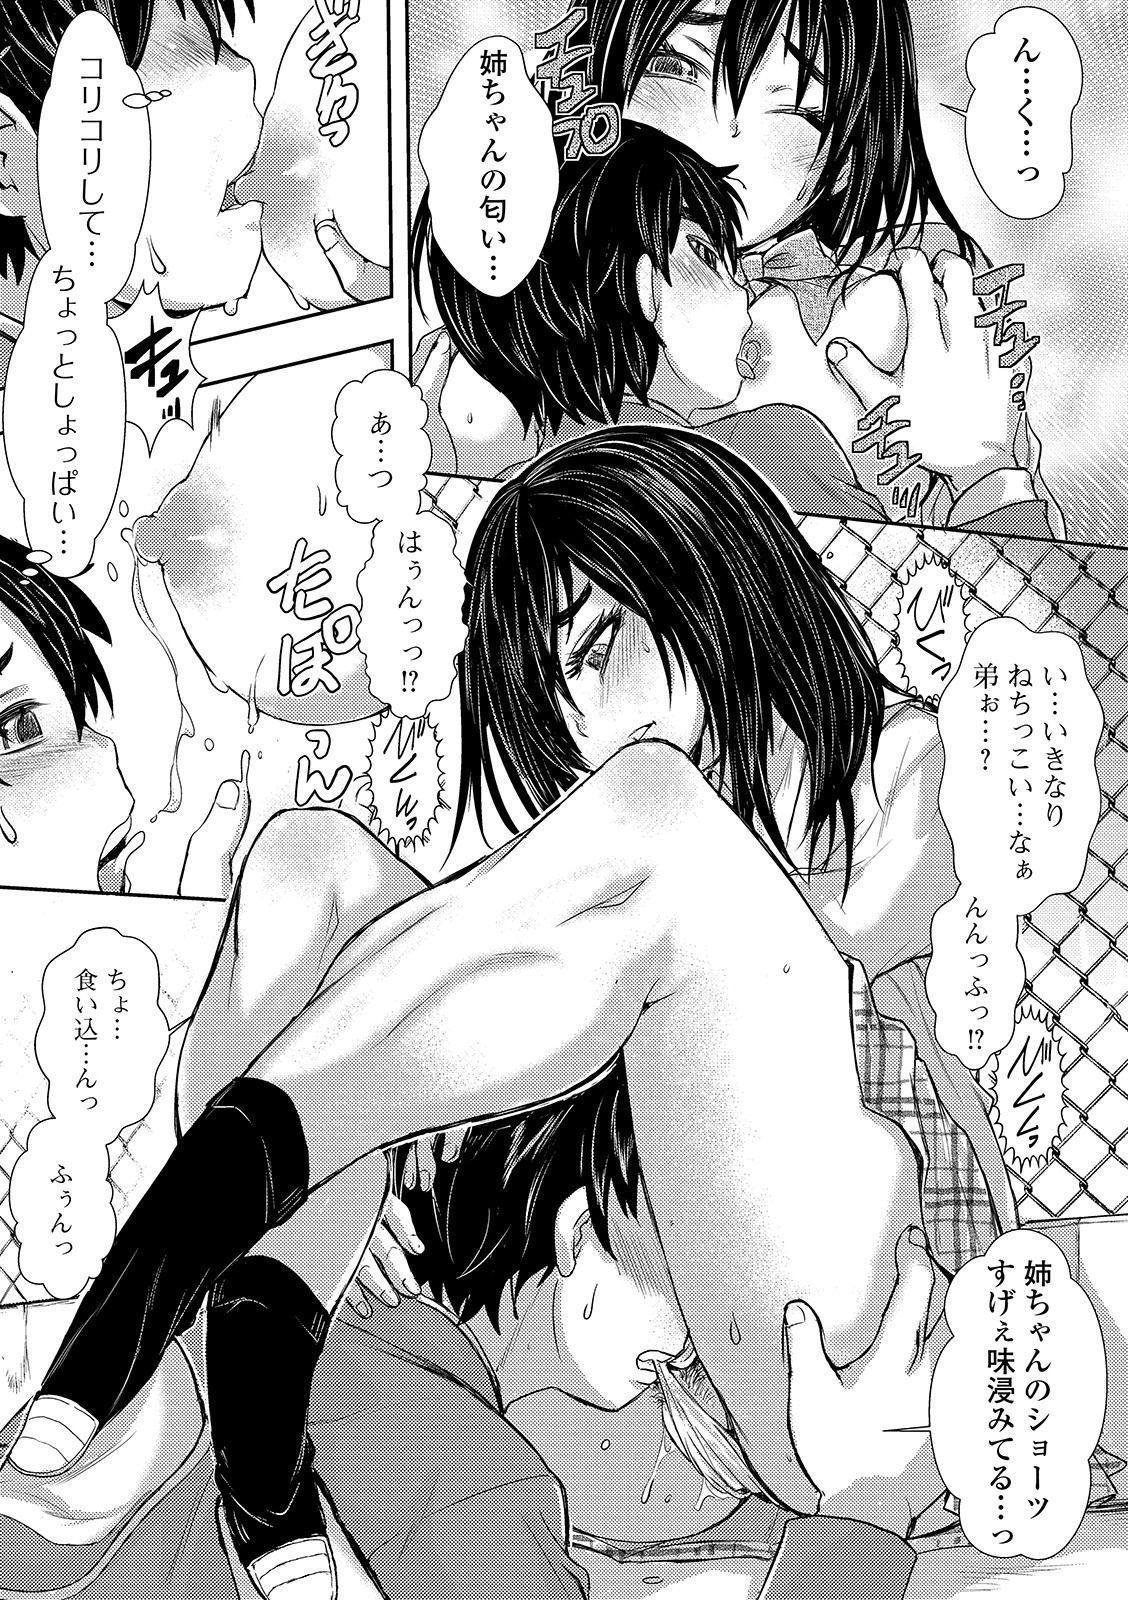 COMIC Shigekiteki SQUIRT!! Vol. 15 214